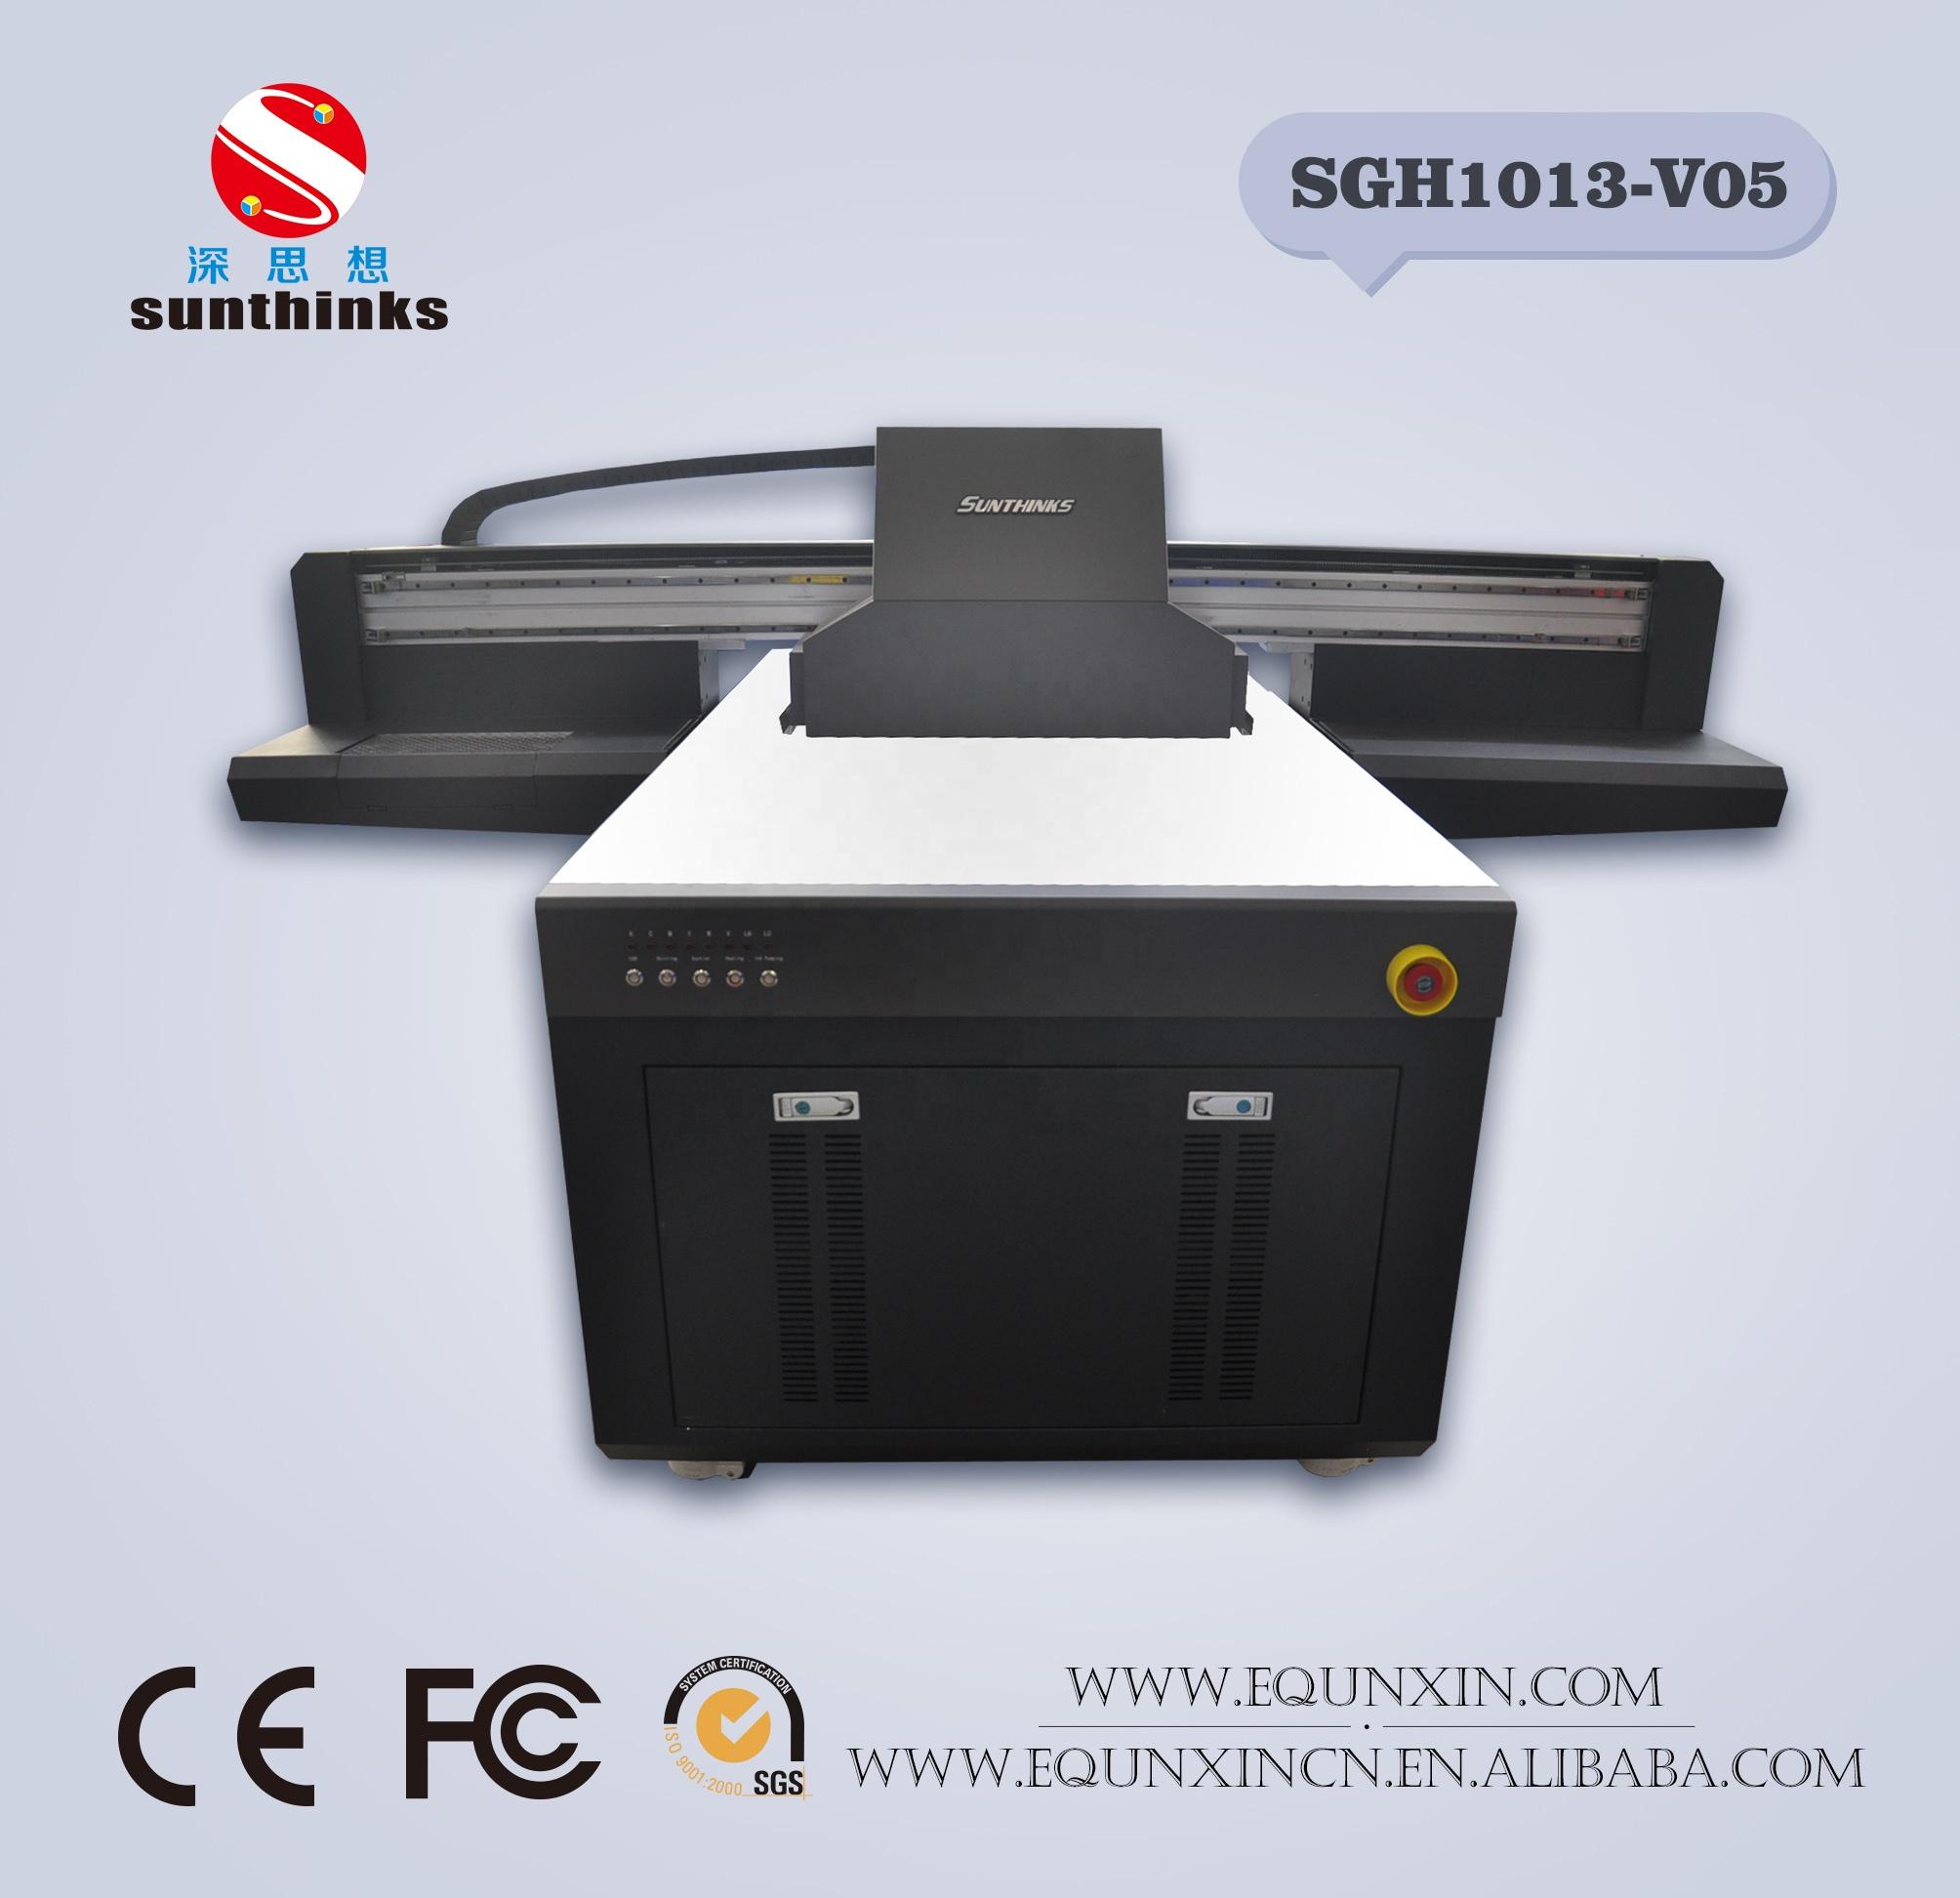 Wood Arcylic Phone Case Uv Flatbed Printer Sgh1115-v05 With Ricoh Gh2220  Printhead - Buy Gh2220 Printhead,Phone Case Printer,Arcylis Wood Printer